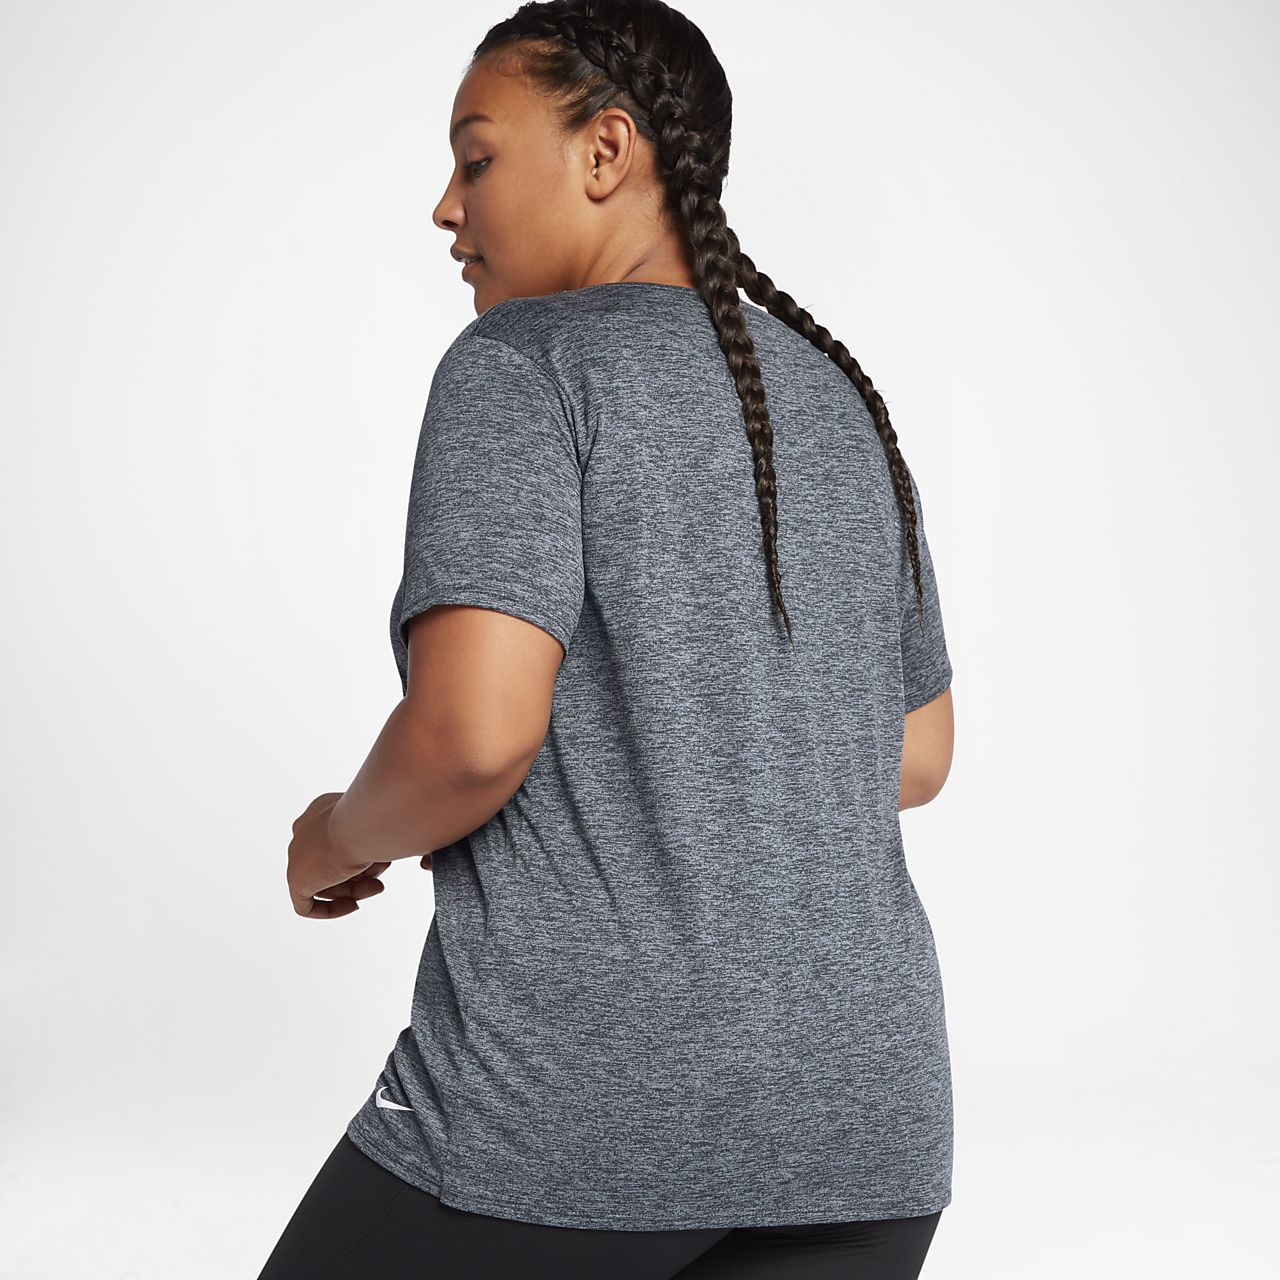 nike dry legend (plus size) women's short sleeve training top